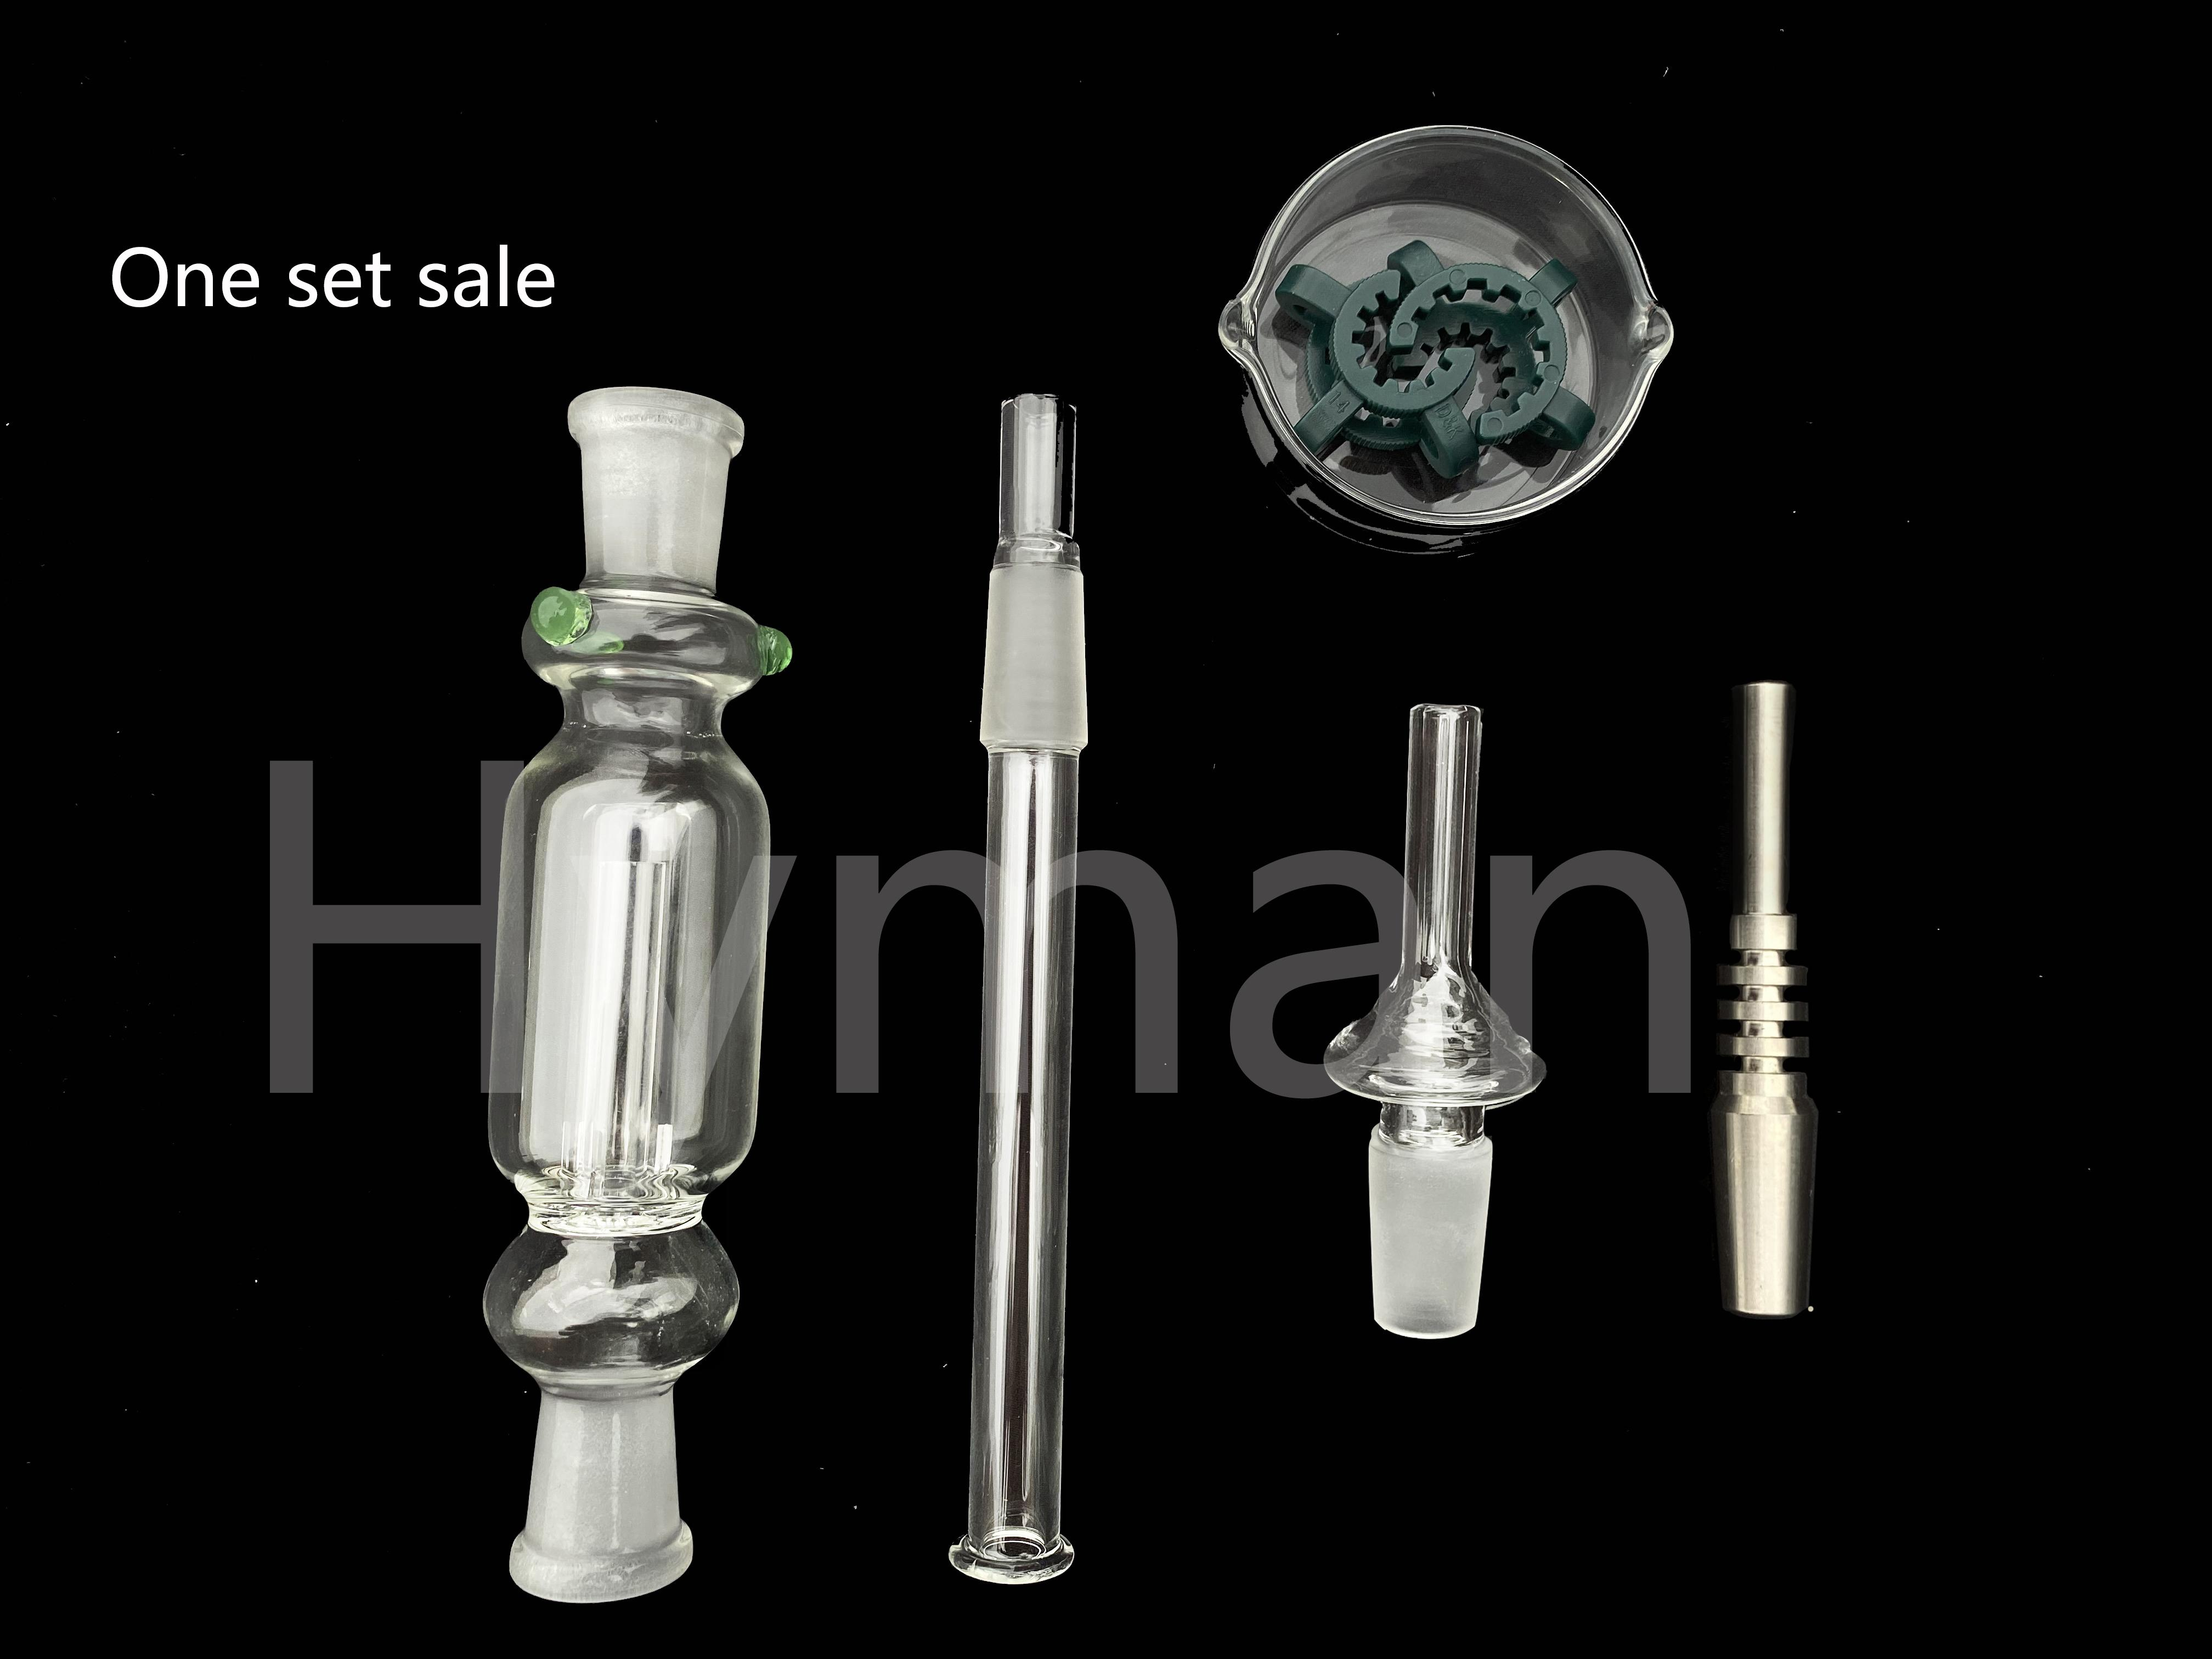 Verre Nectar Collecteur Kit Hookah 10mm 14mm Quartz Domeless Titanium Tip Straw DAB BONG HoneyBird Accessoires ACCESSOIRES D'ALIMENTATION